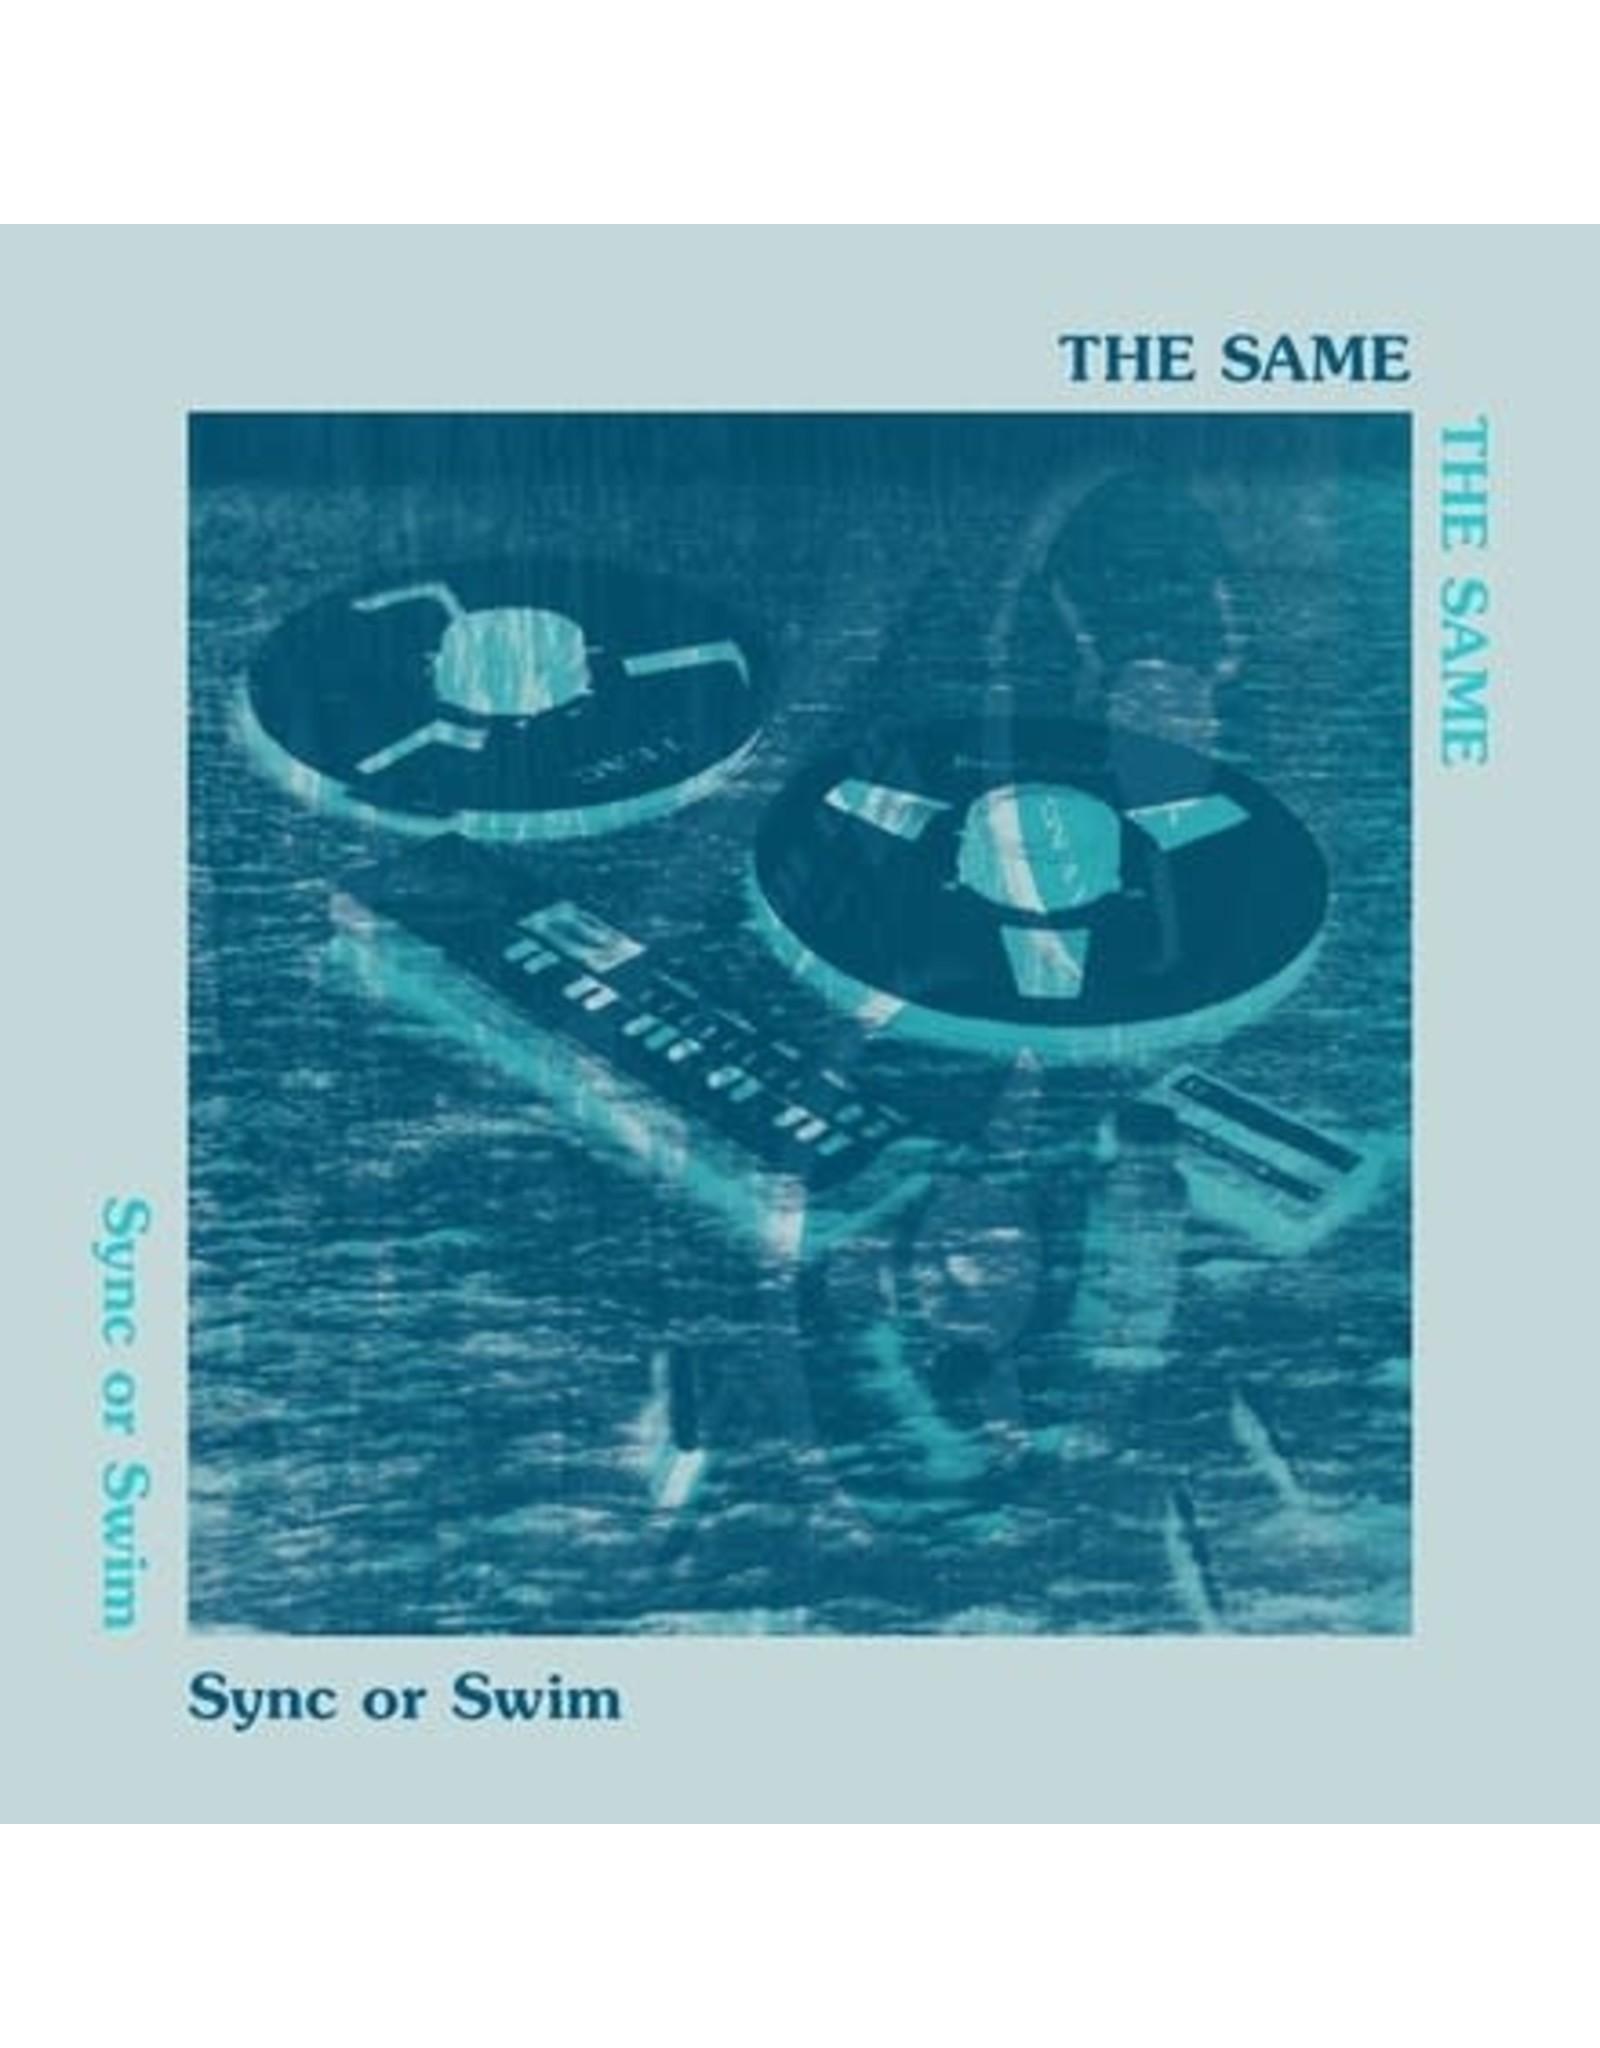 Freedom to Spend Same: Sync Or Swim LP